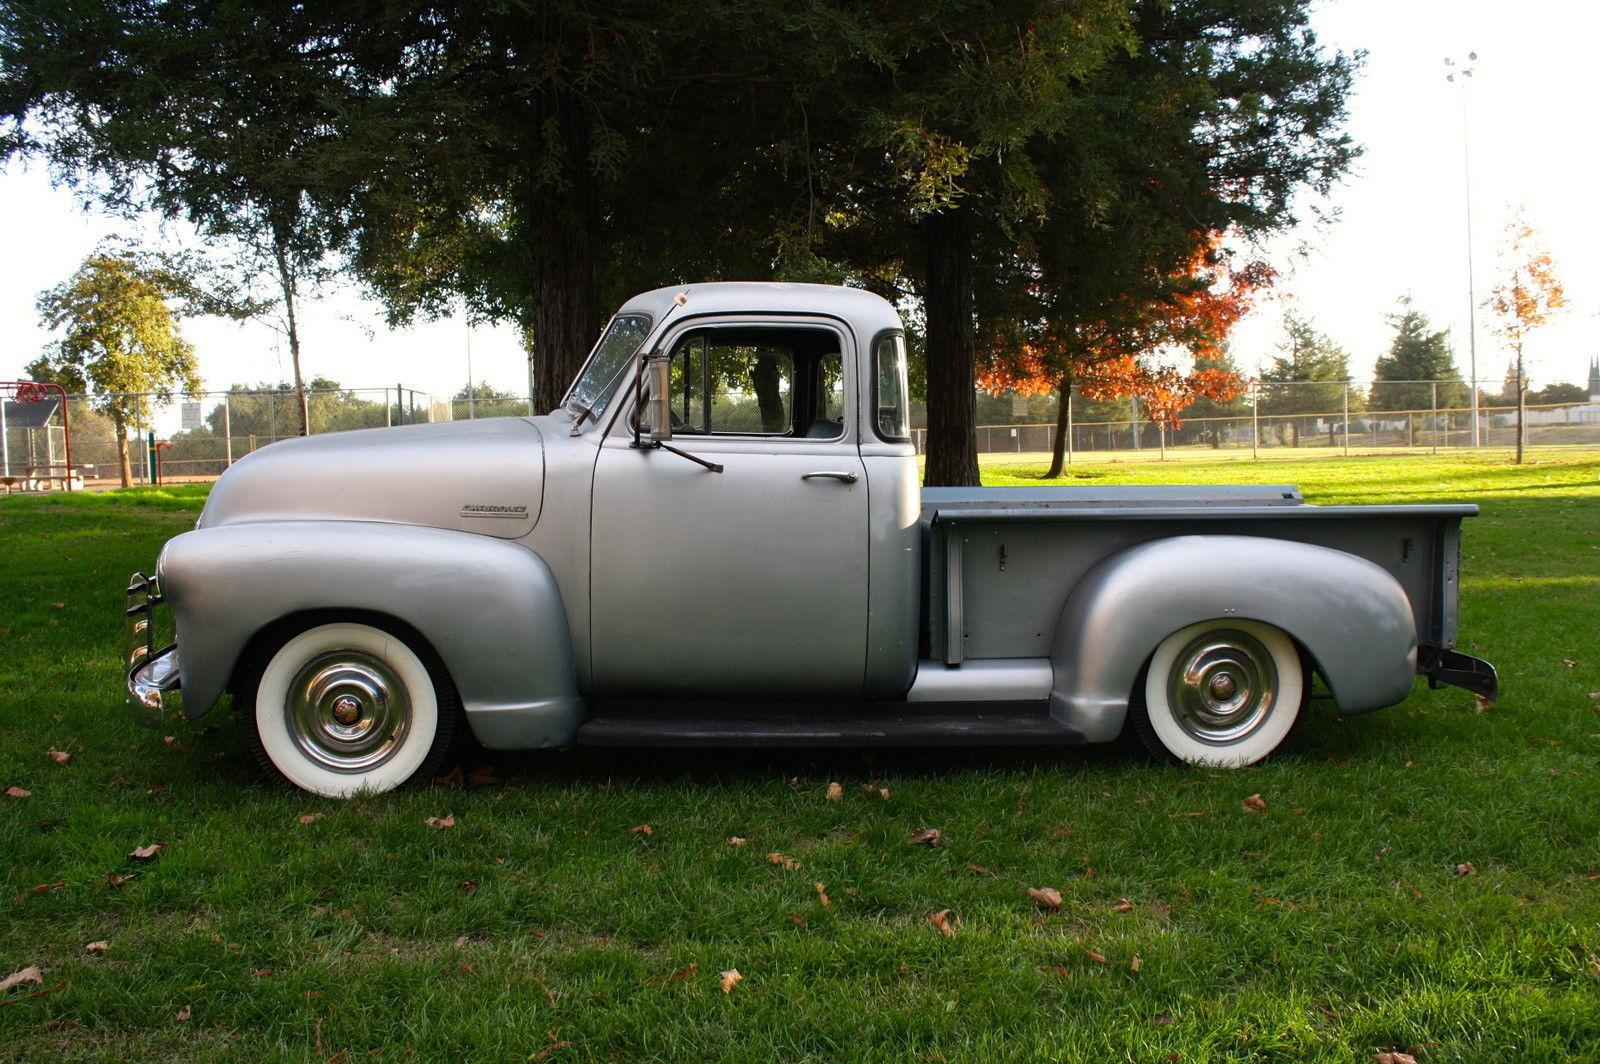 Ford Truck 1949 49 Mercury M 68 1 Ton Pickup Wiring Diagram 1951 F1 For Kids